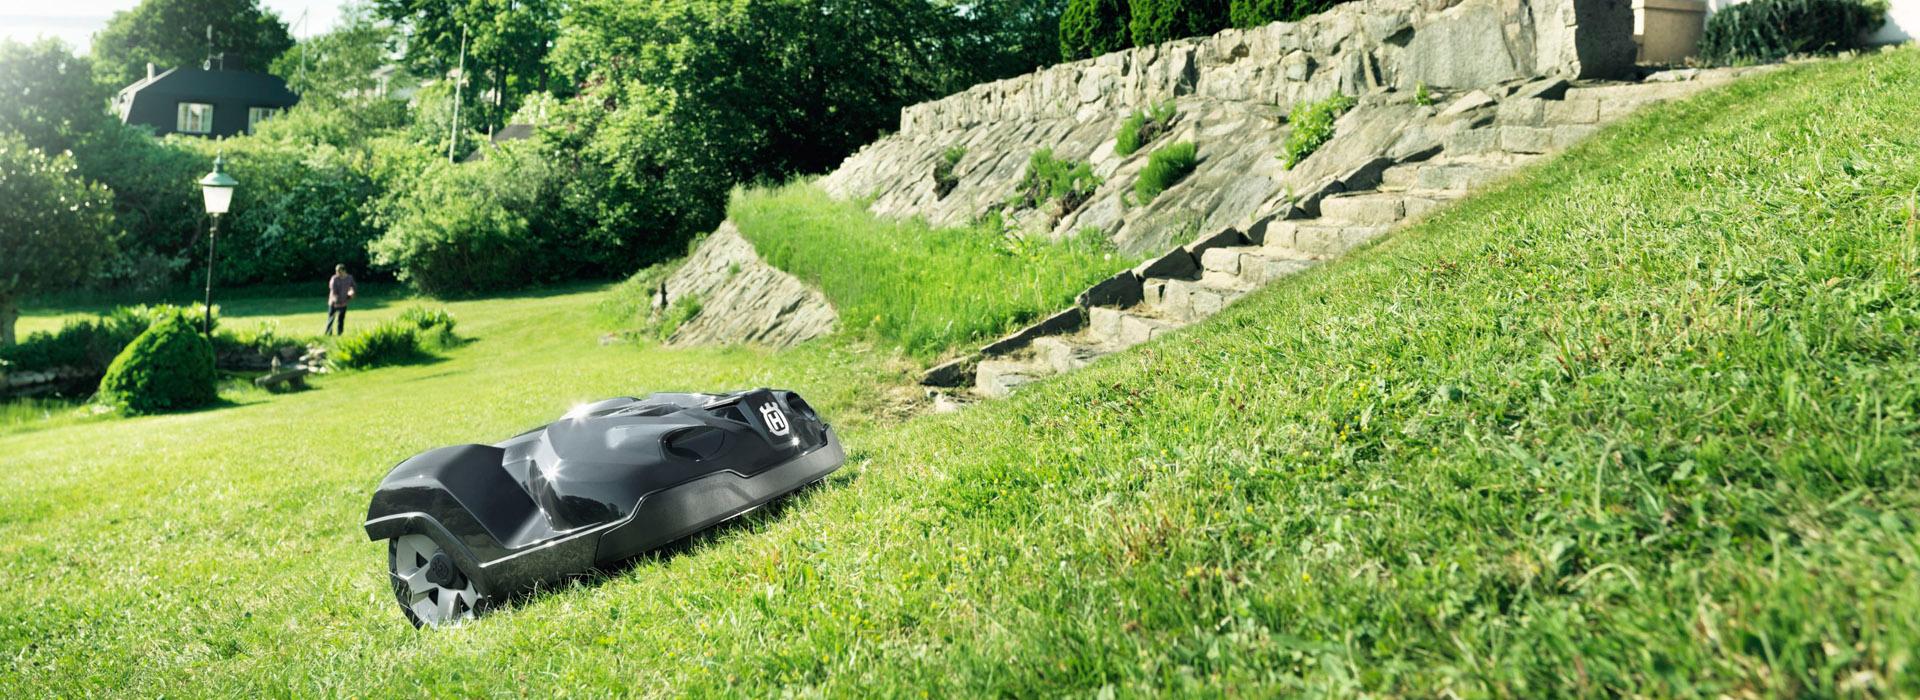 Boerger-Motorgeraete-Husqvana-Automower-Rasenroboter-FAQ